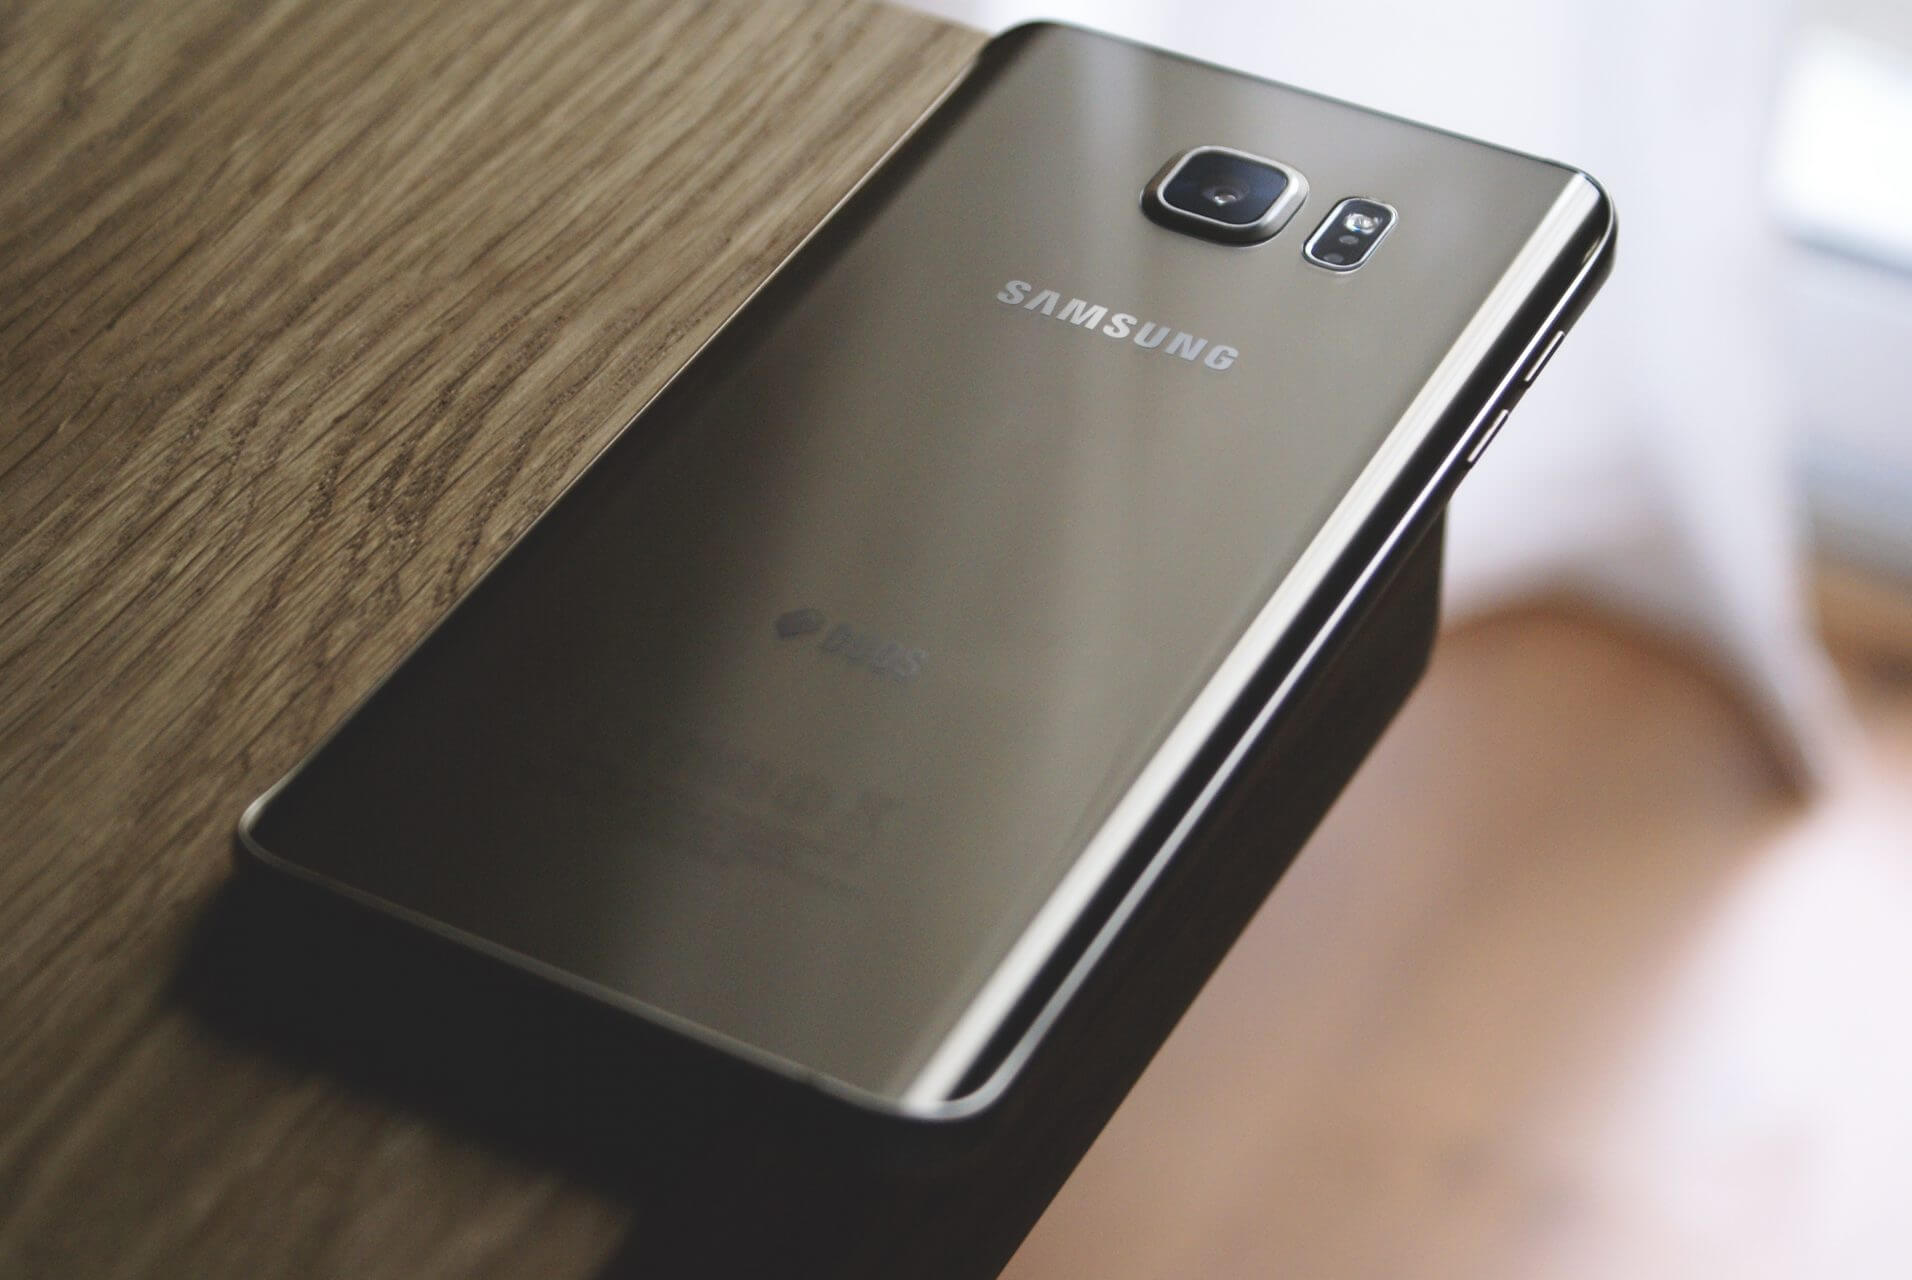 Son Galaxy S7 brûle, Samsung lui offre un Galaxy S9 en compensation